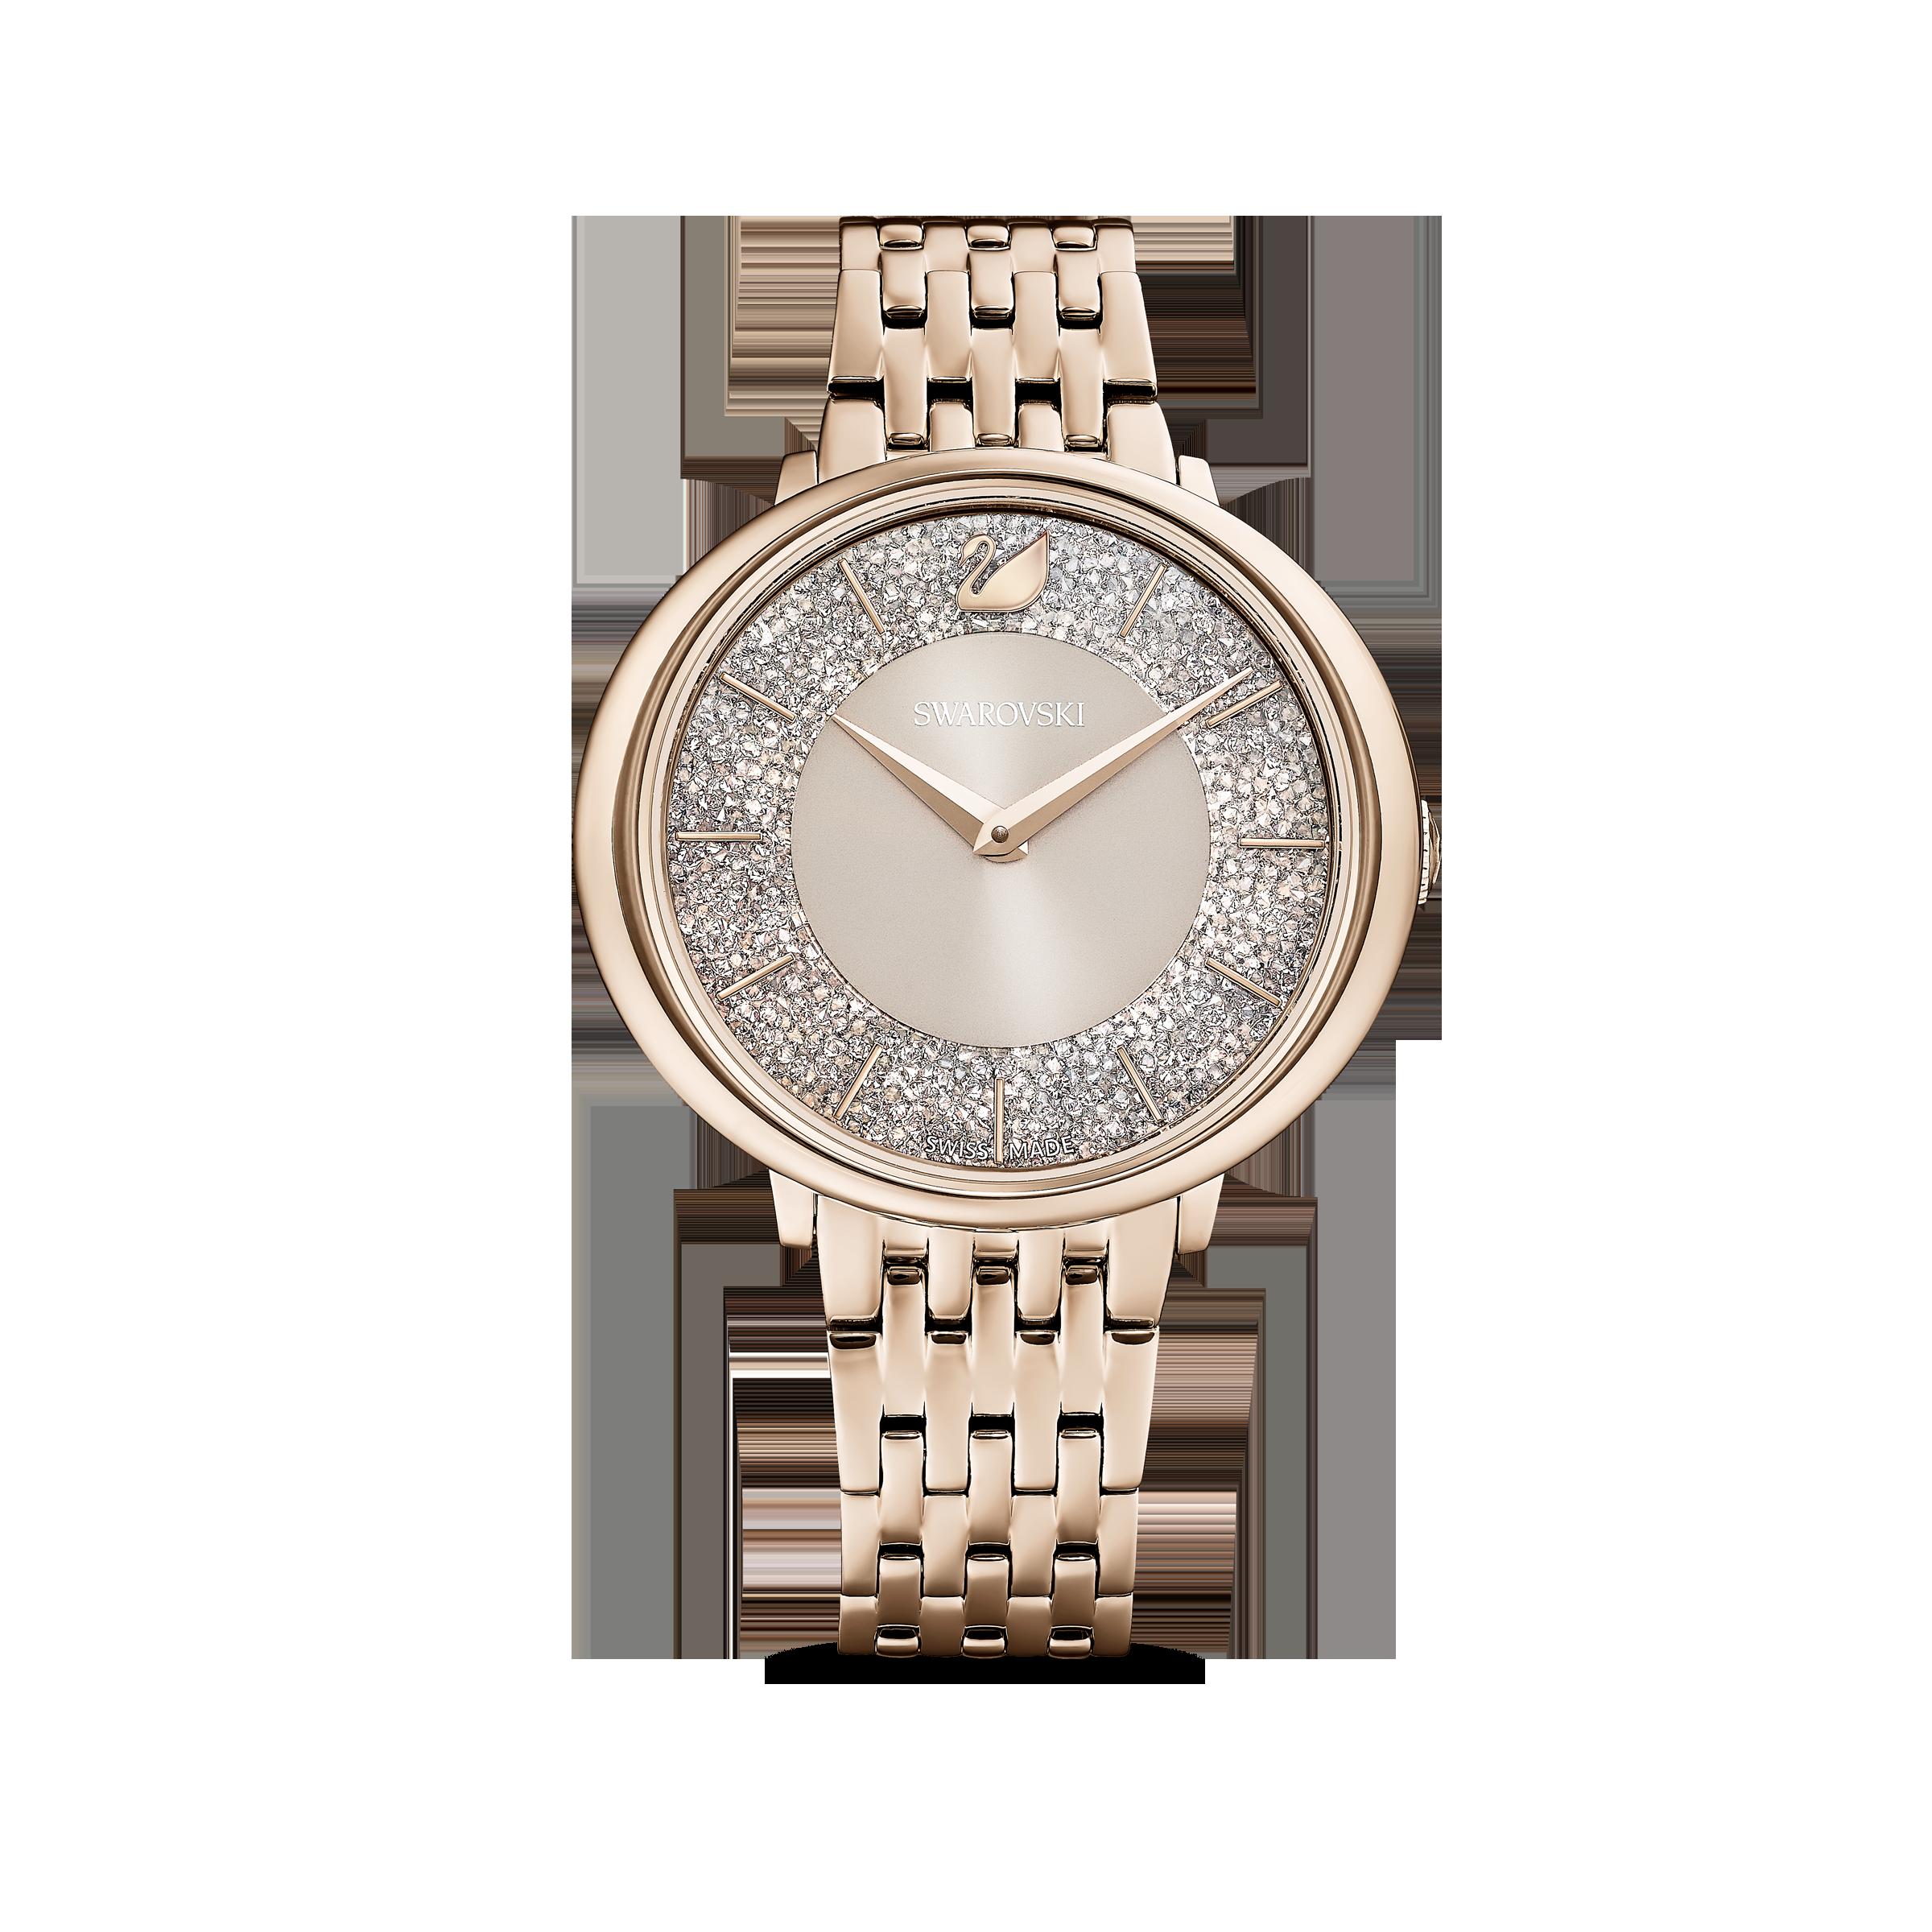 Crystalline Chic Watch, Metal bracelet, Grey, Champagne-gold tone PVD